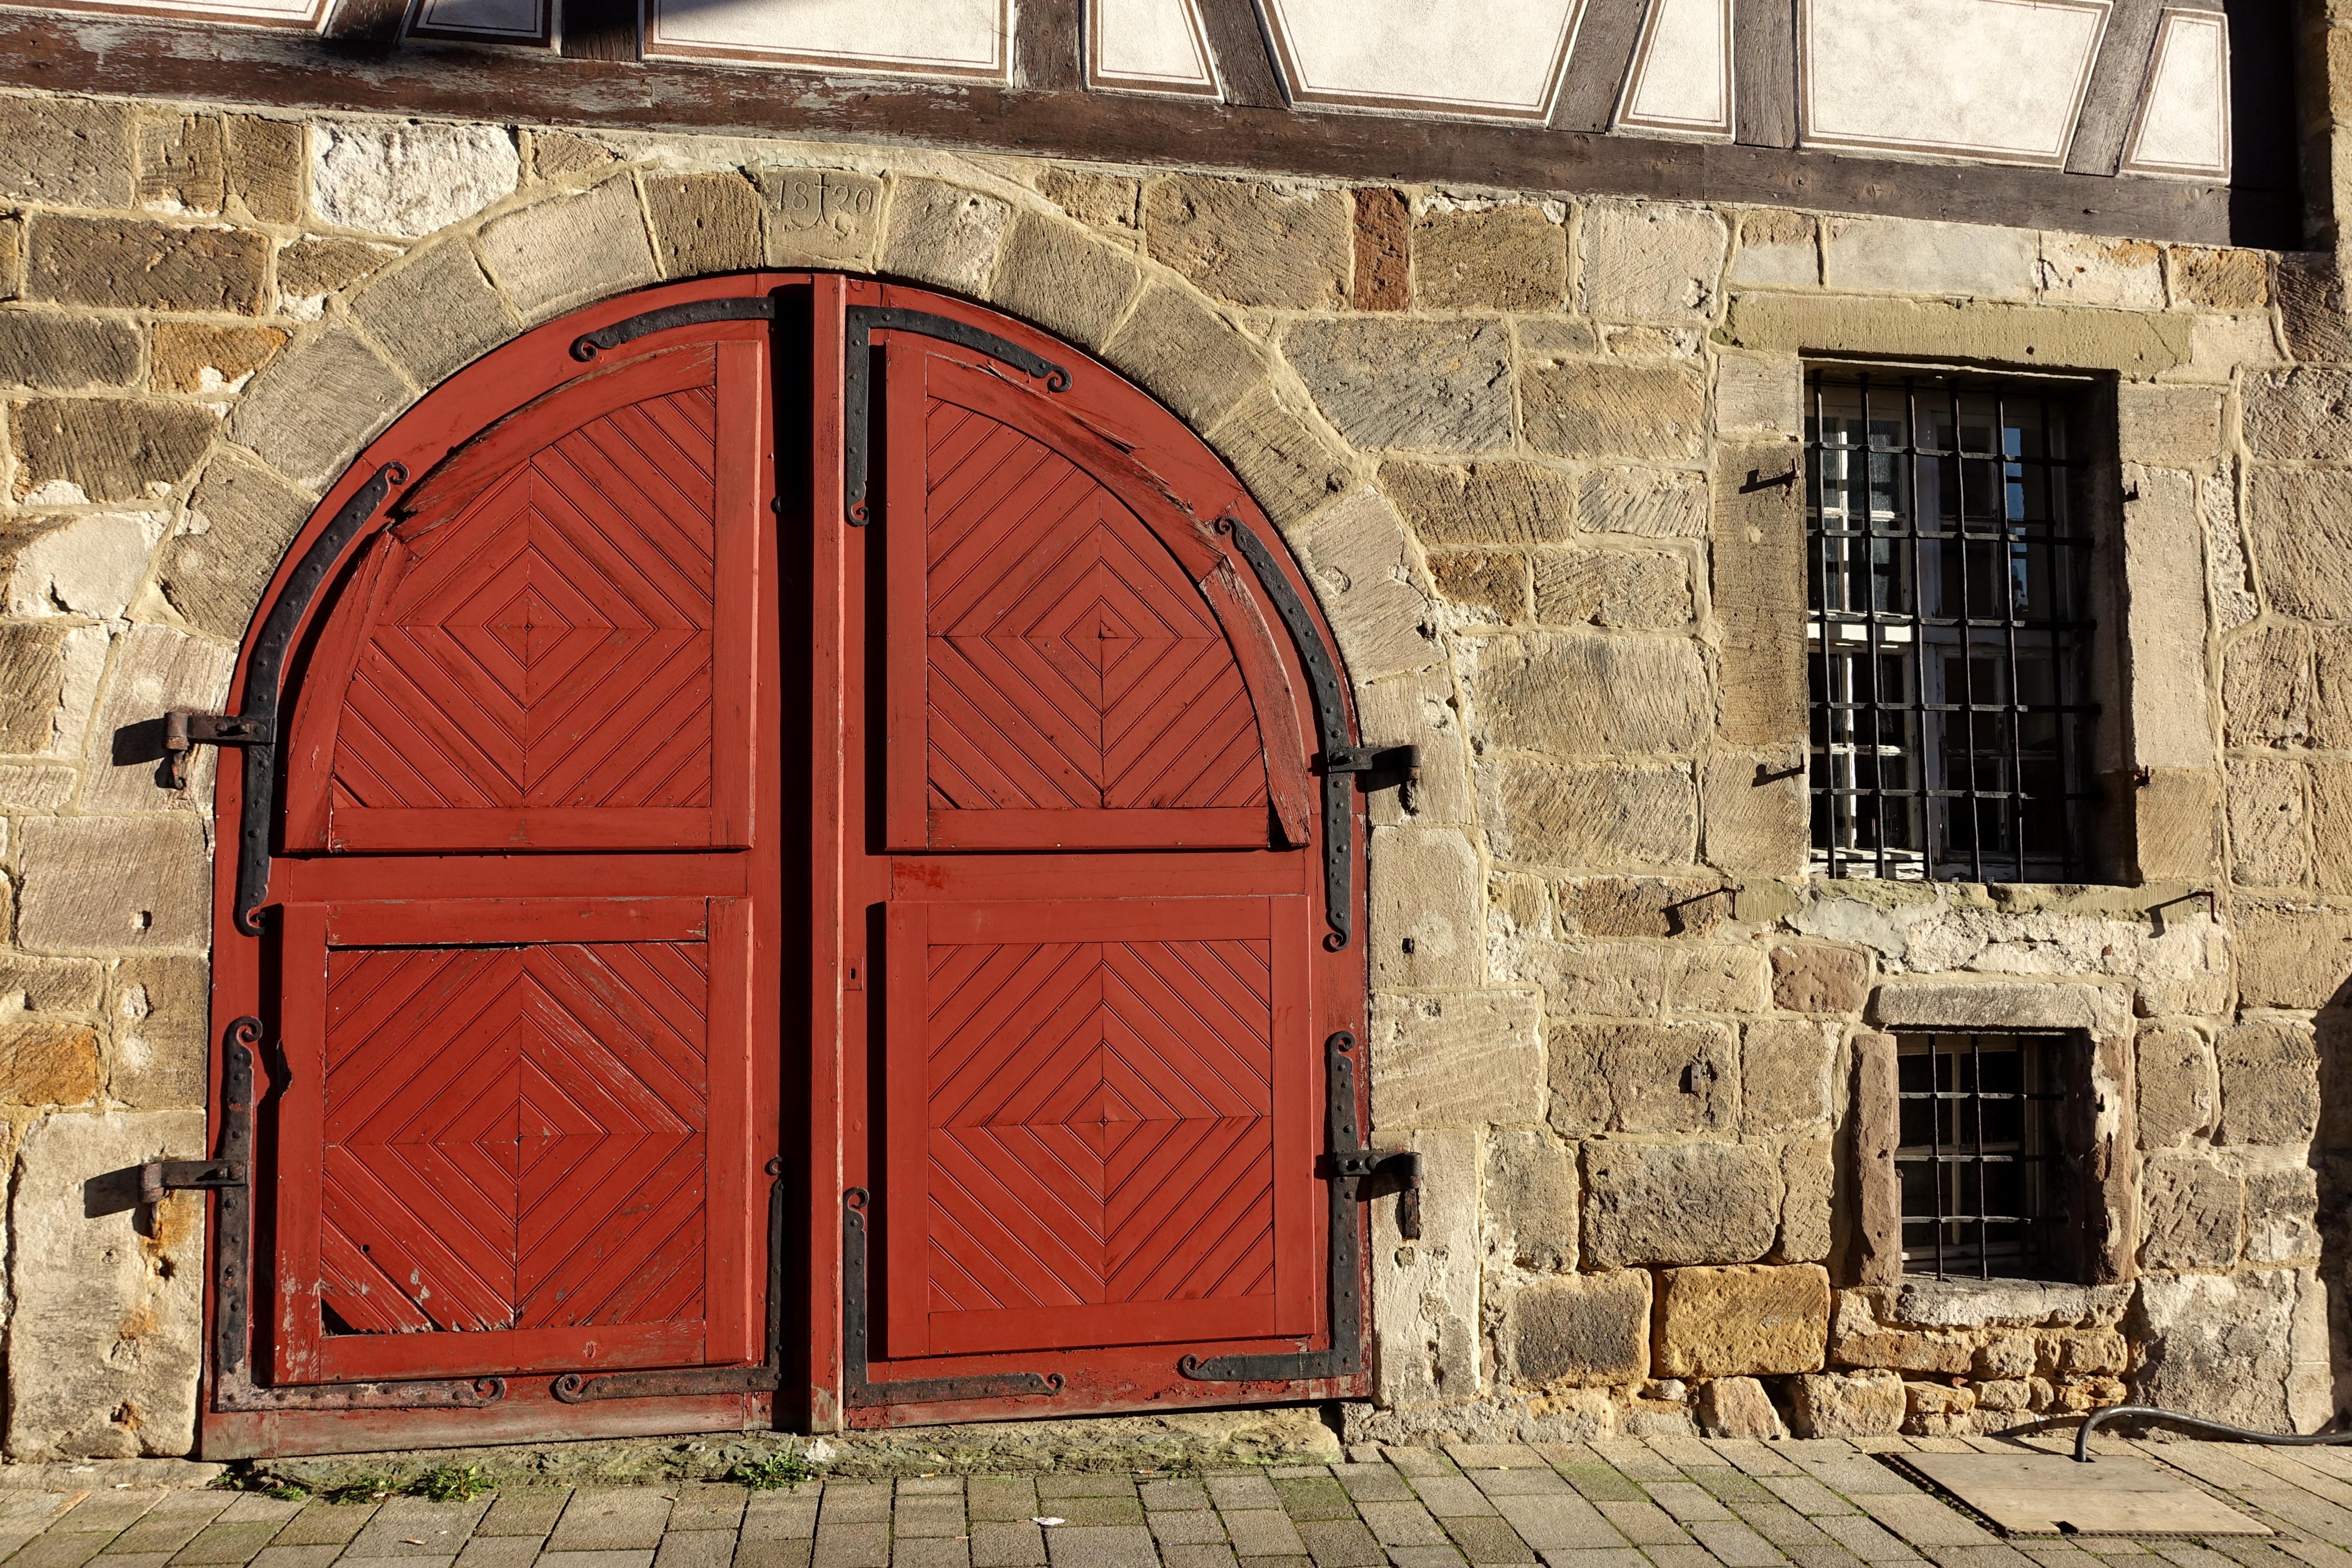 Unglaublich Garage Am Haus Beste Wahl File:kessler- (sektkellerei Kessler) - Esslingen Neckar, Germany